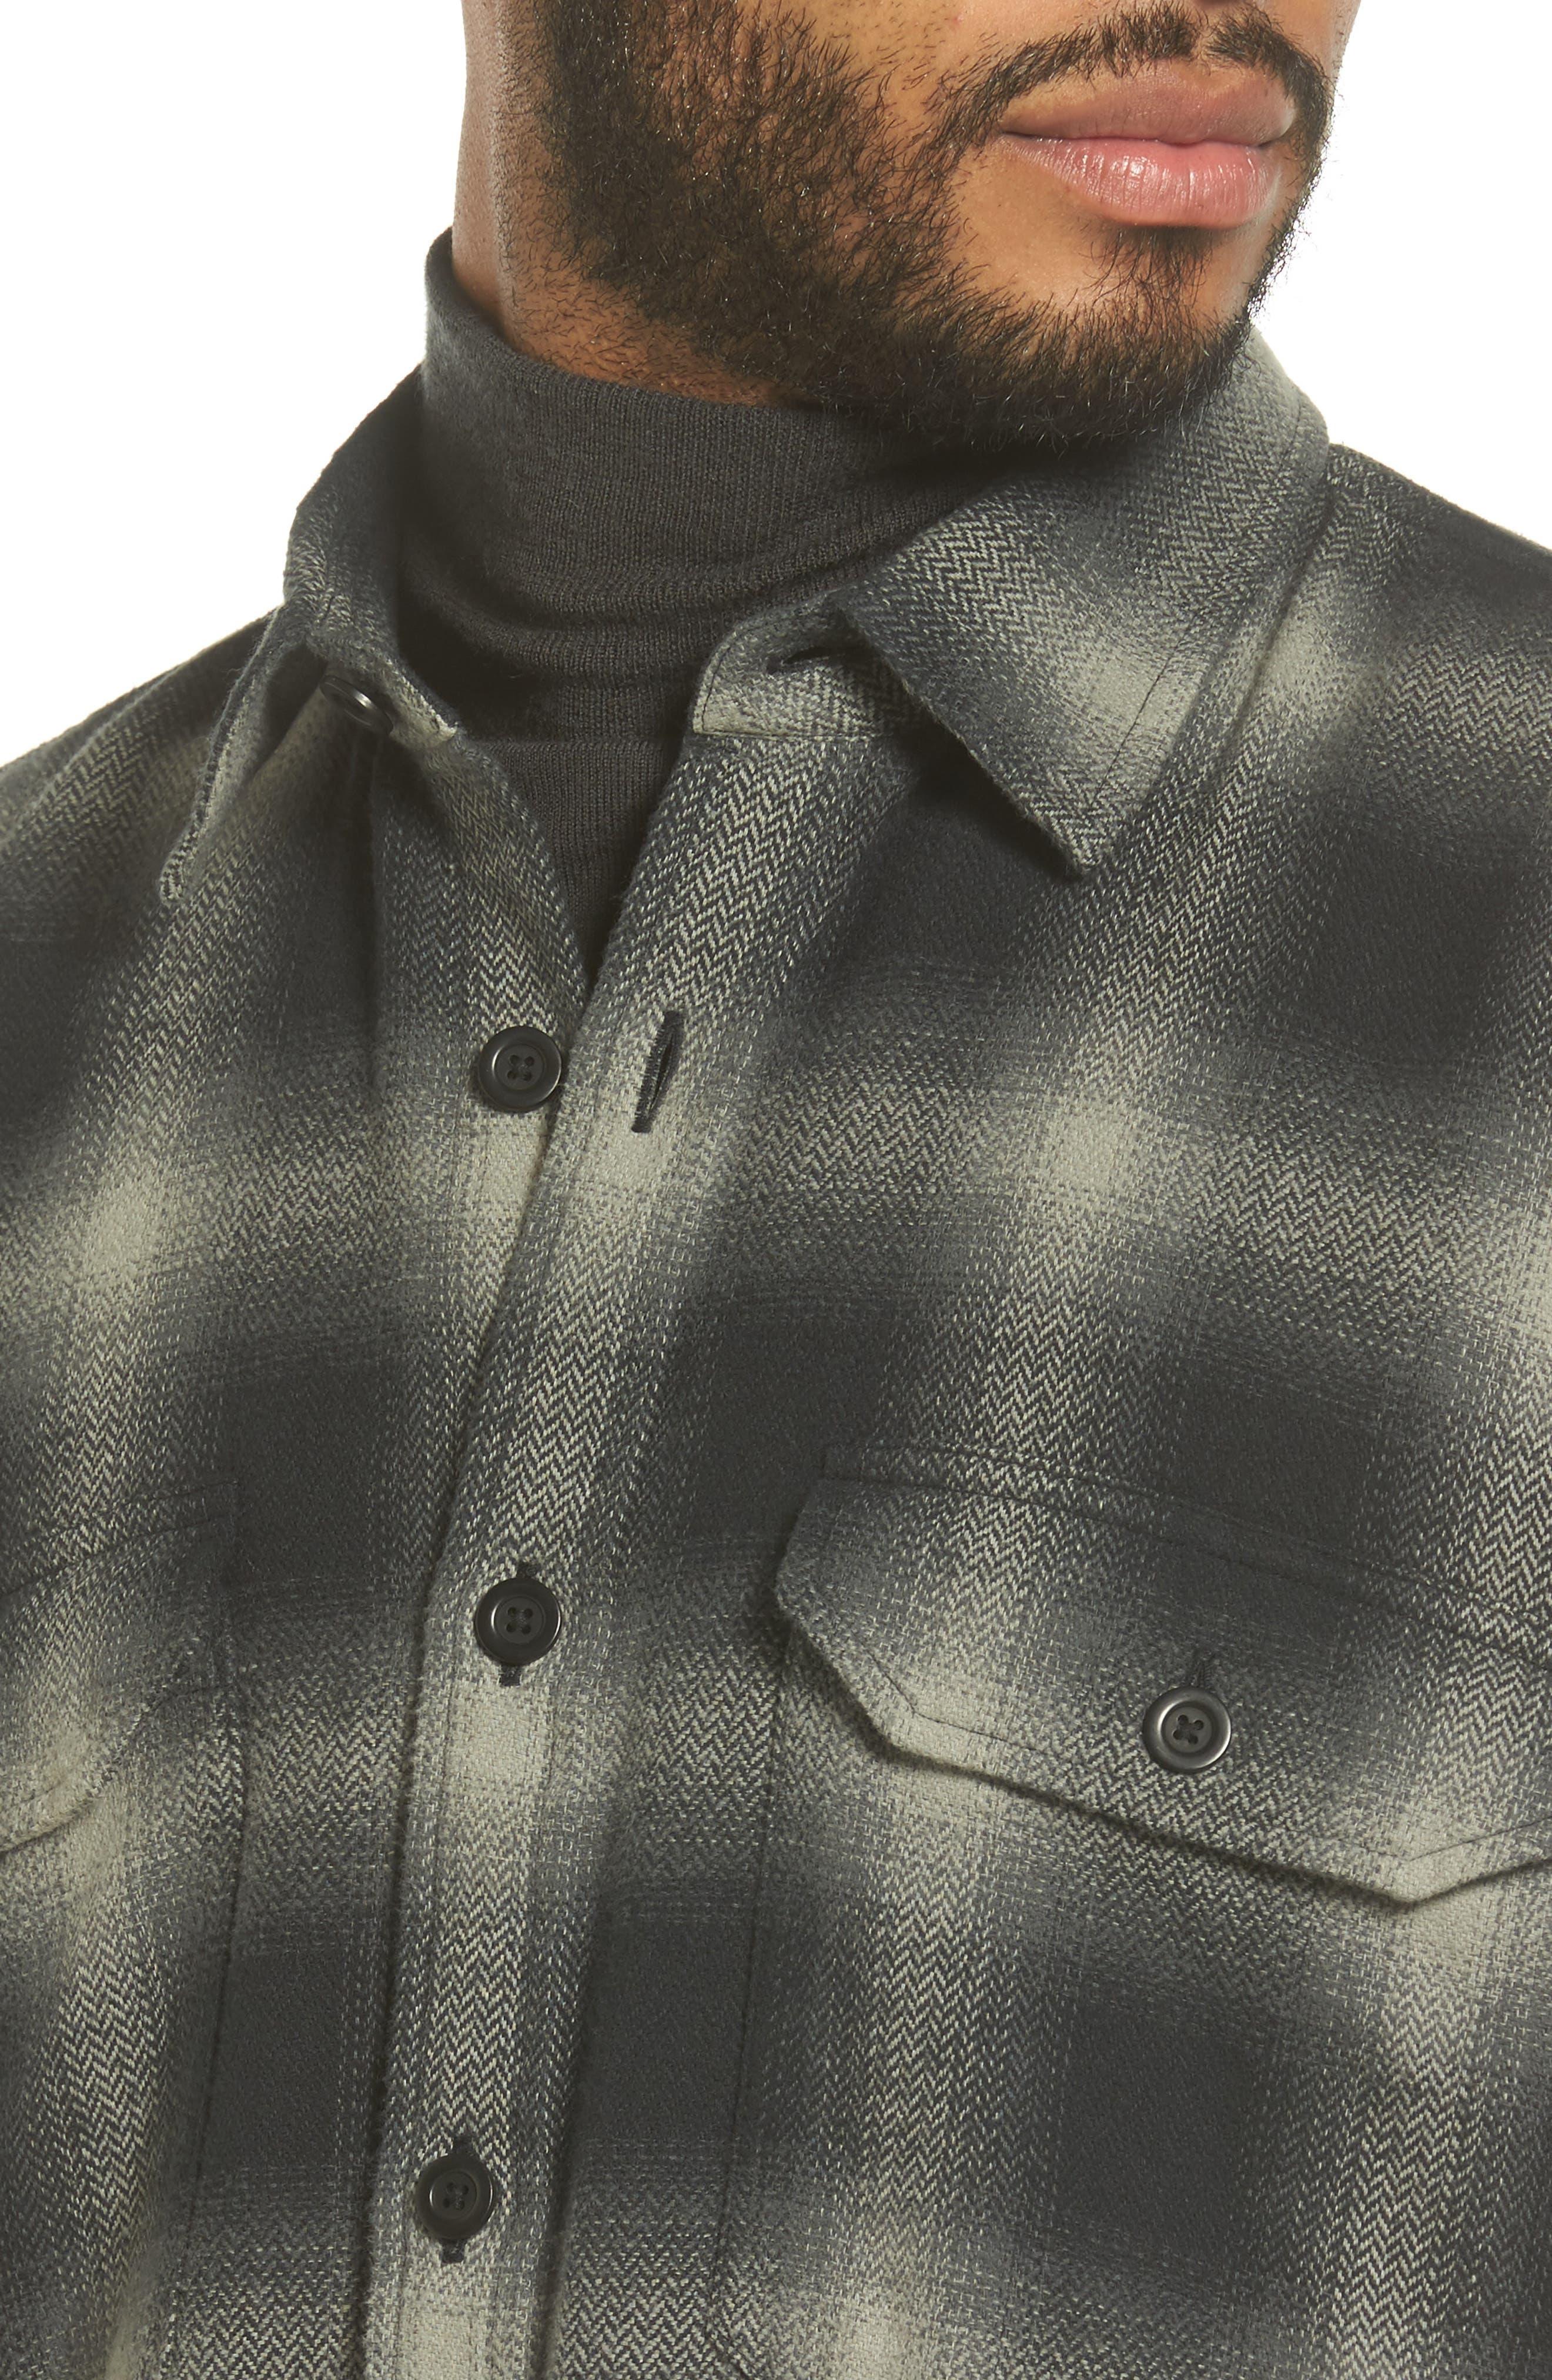 Ombré Buffalo Plaid Sport Shirt,                             Alternate thumbnail 4, color,                             Grey